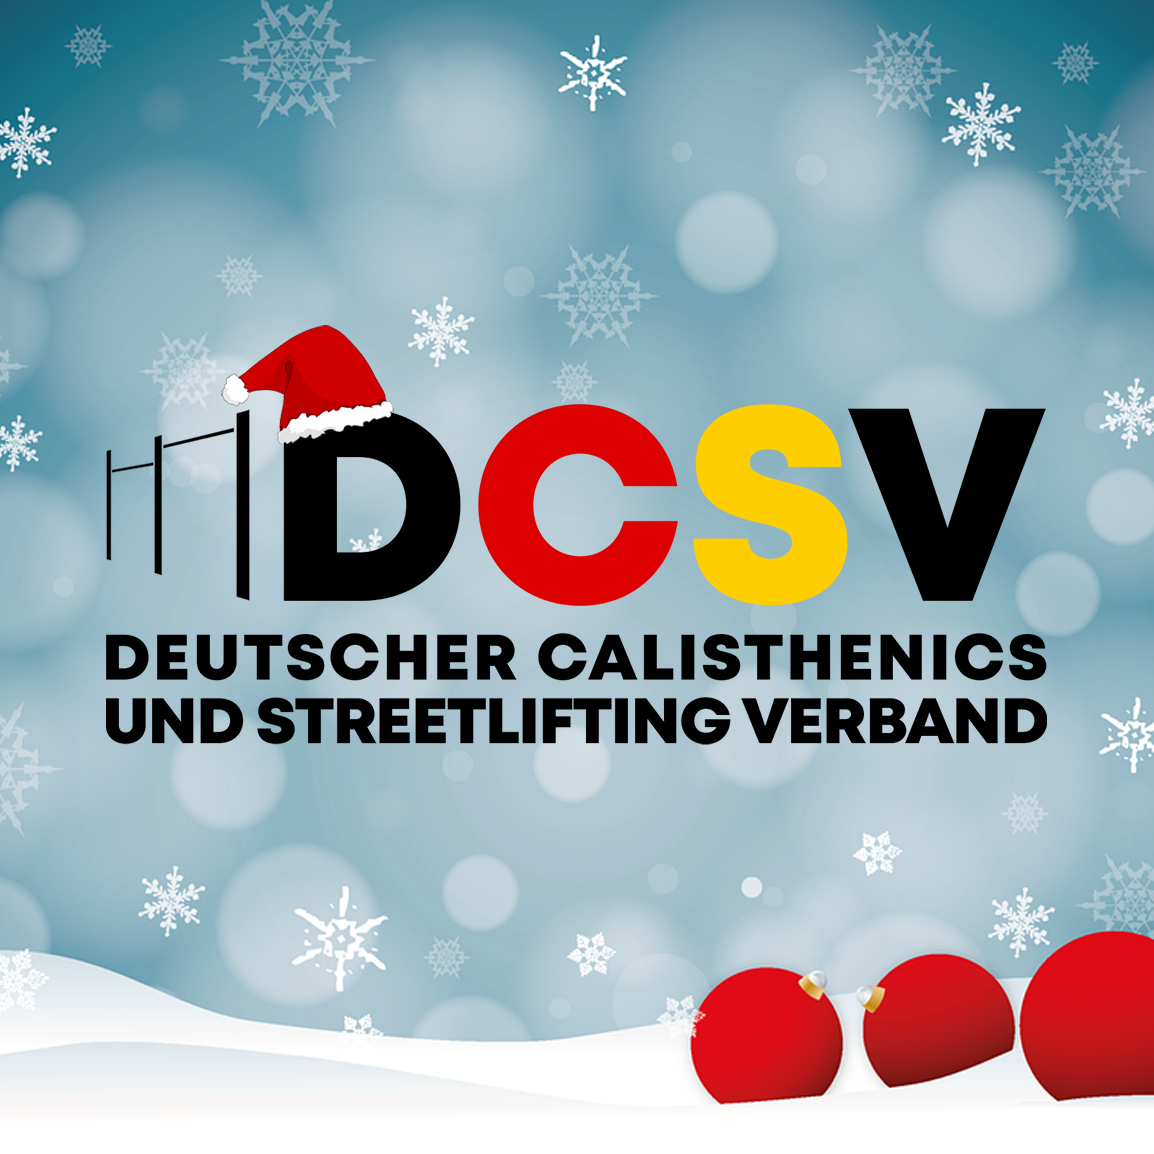 Frohe Weihnachten wünscht das gesamte DCSV Team